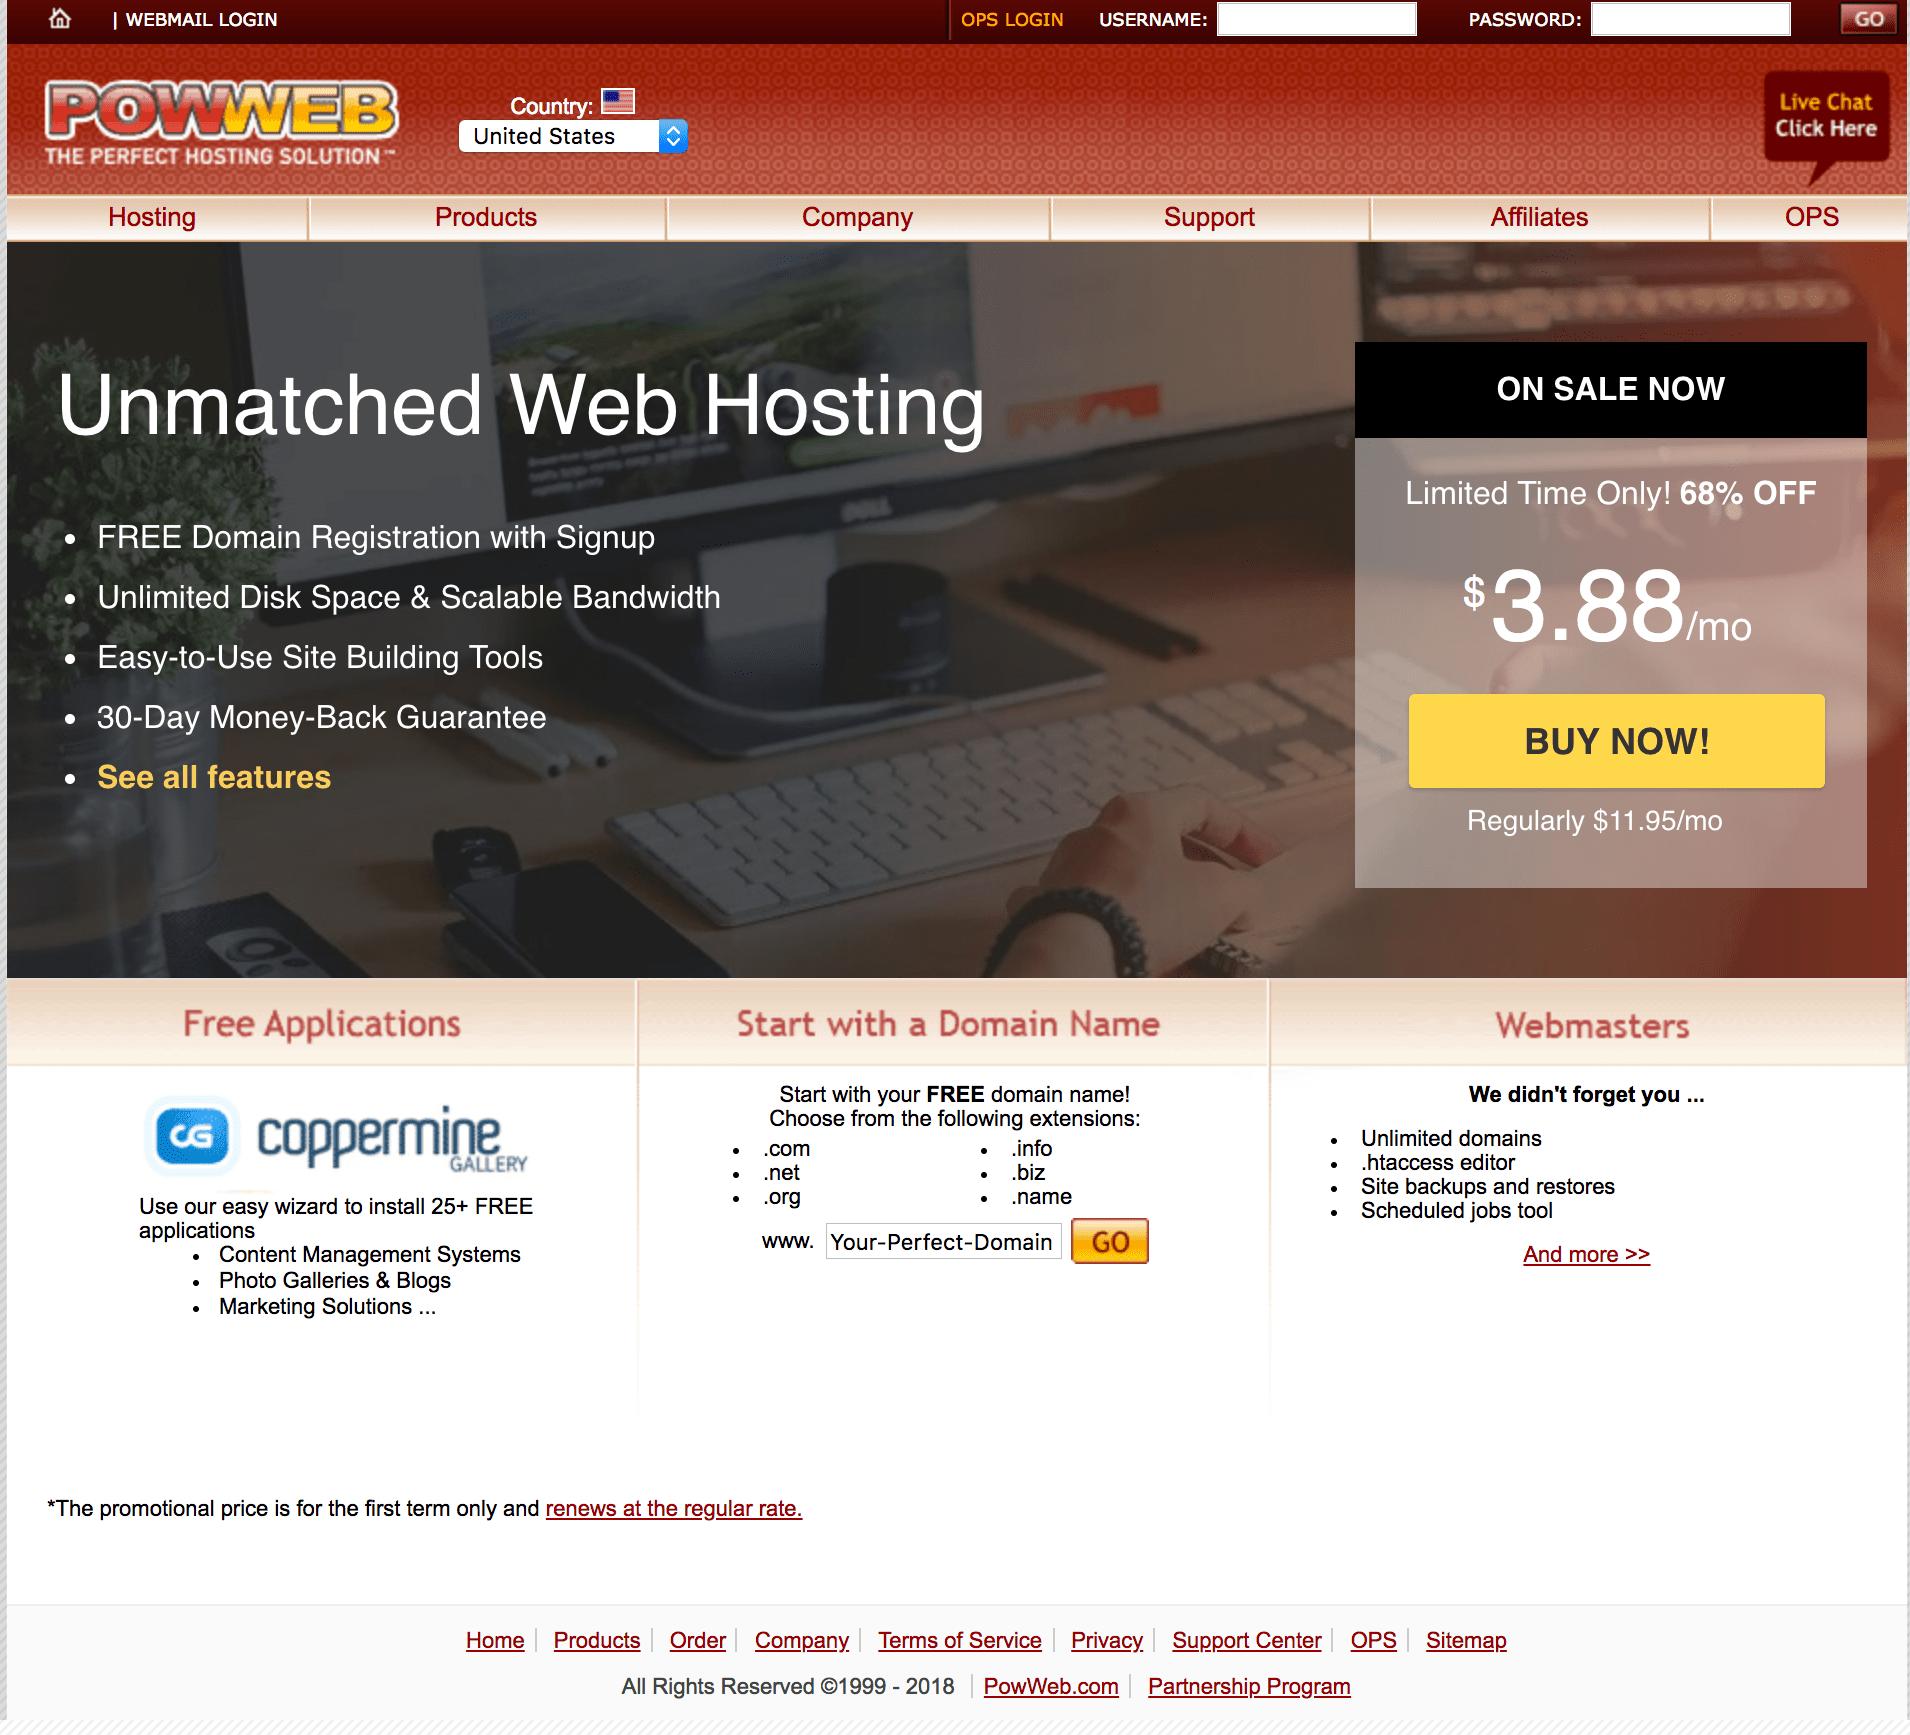 powweb homepage